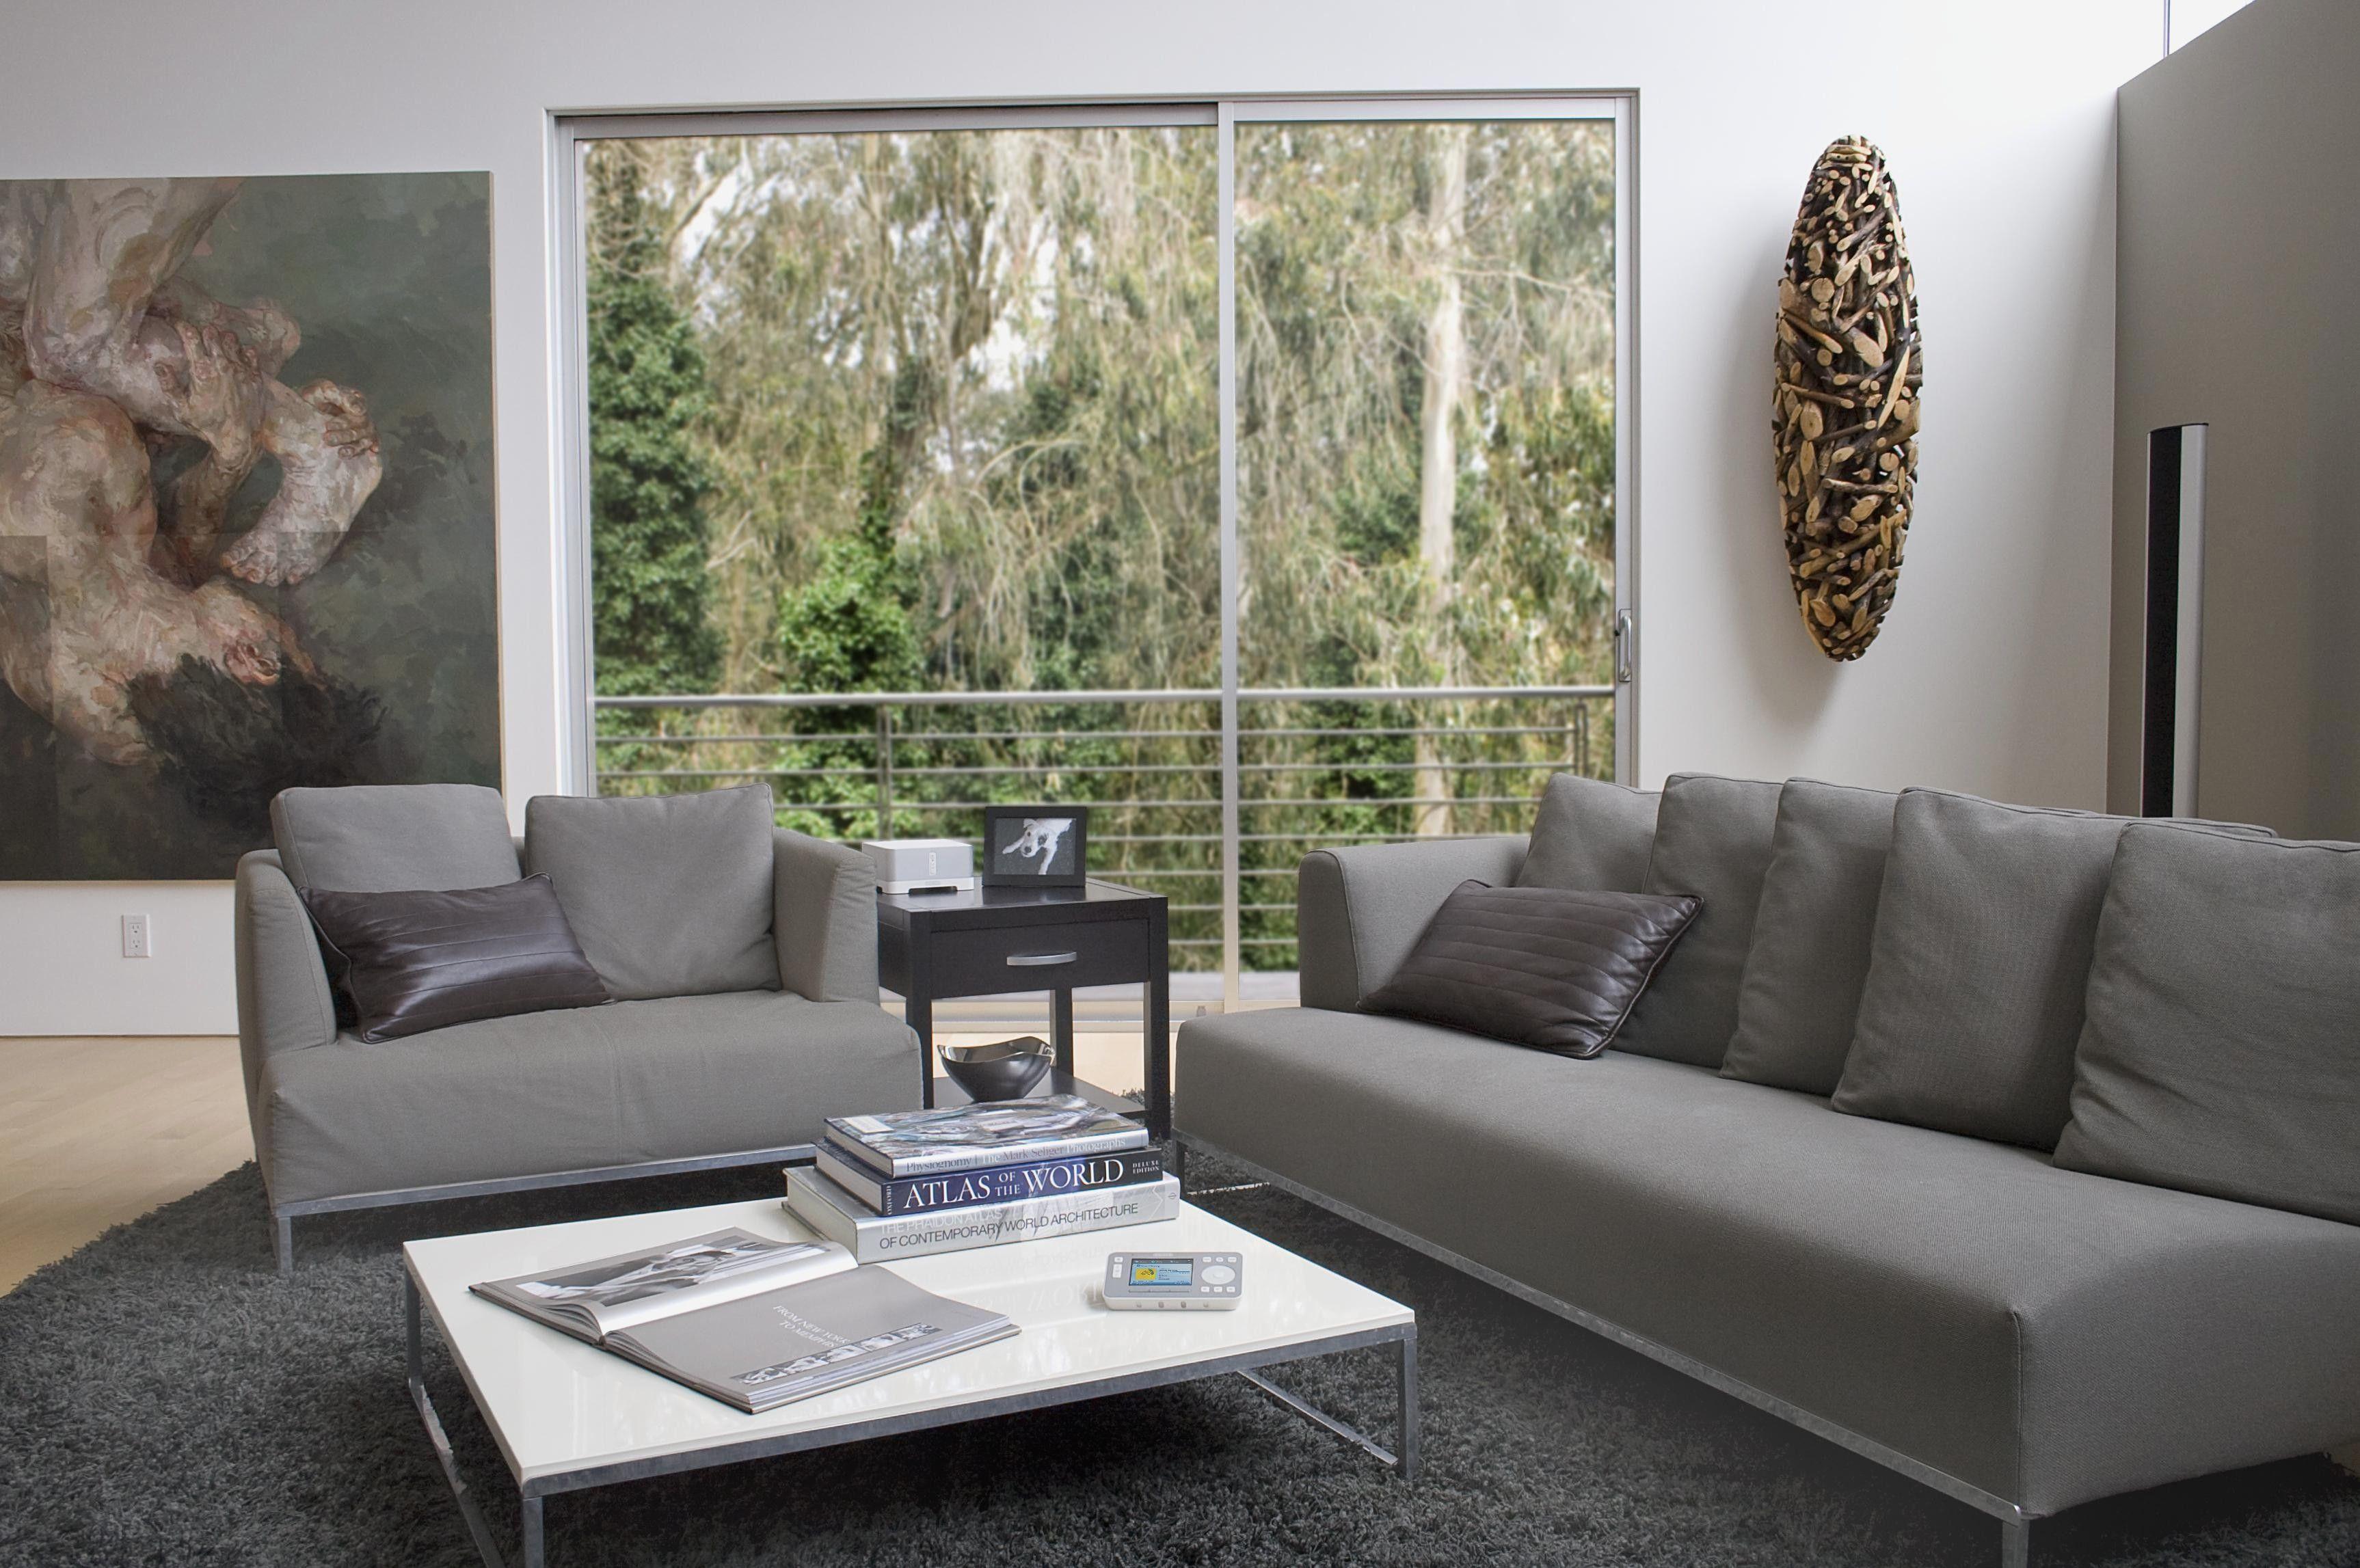 Cool Lounge Concepts  June, 2018